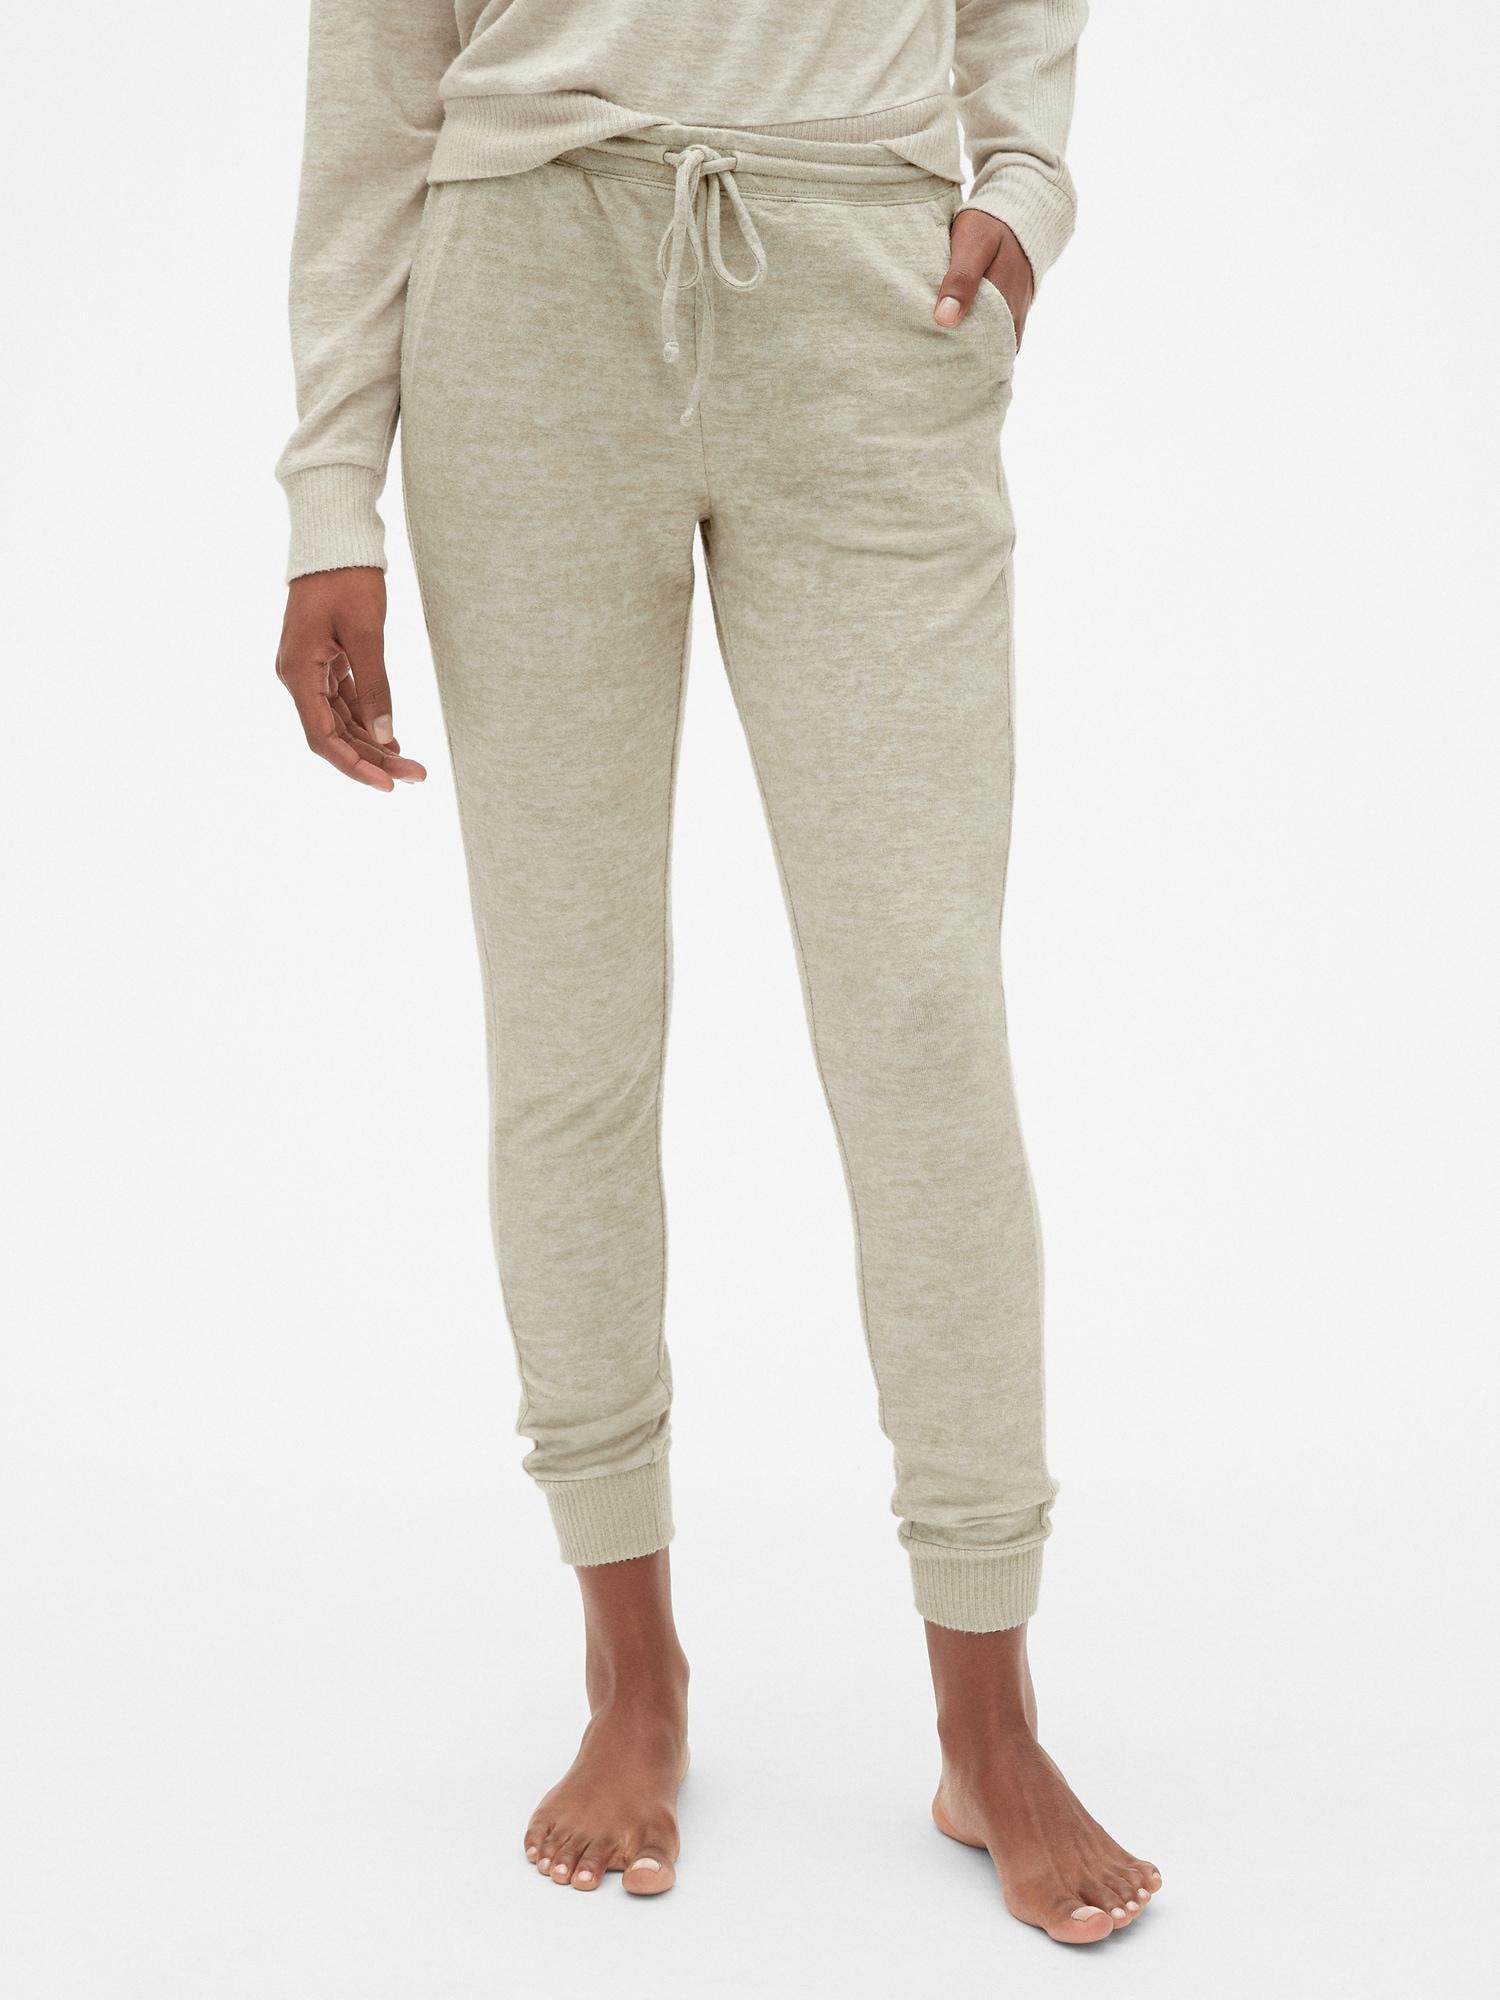 NEW Womens GAP LOGO Sweat Pants Lounge Fleece Sweatpants Pink Cropped Joggers